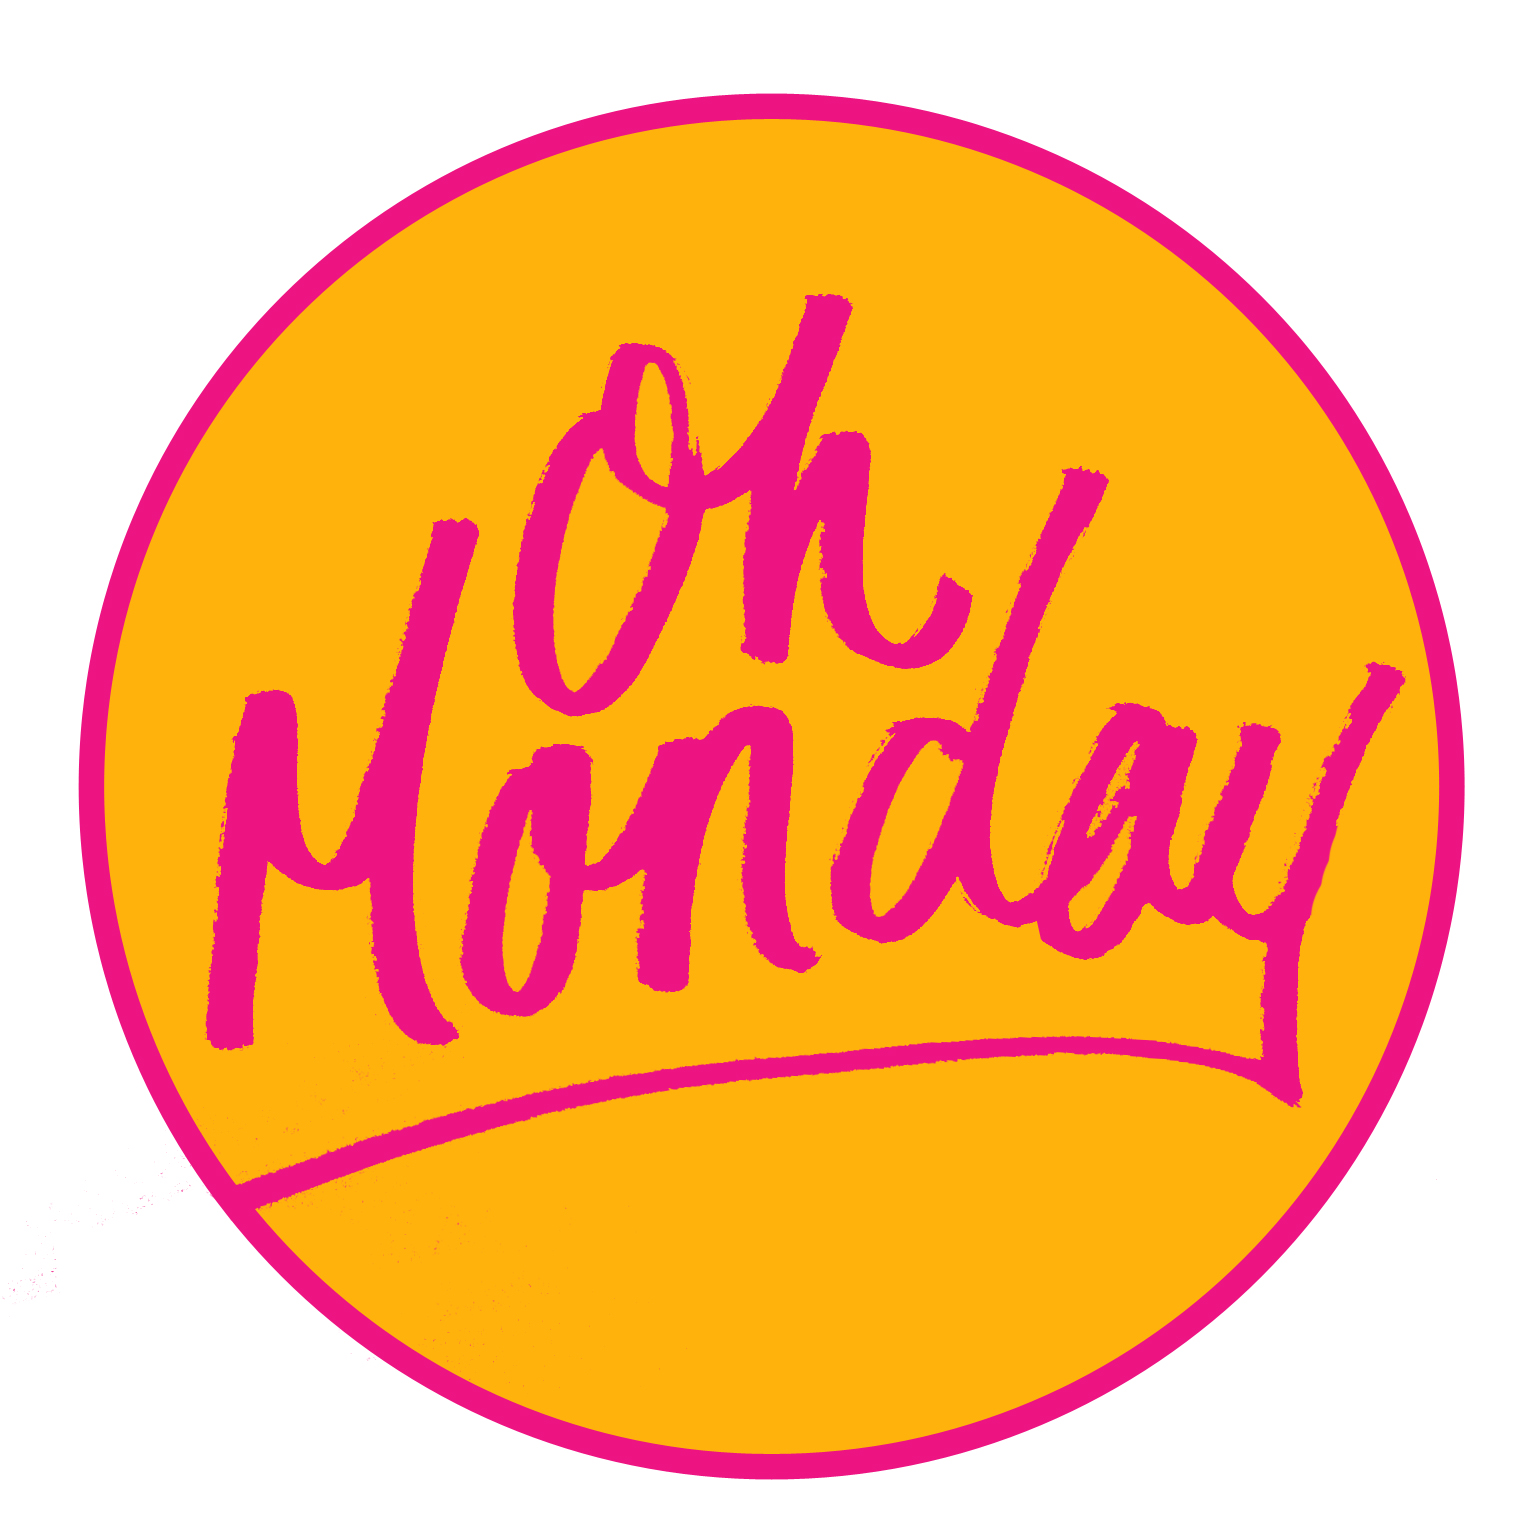 Oh,Monday.jpg